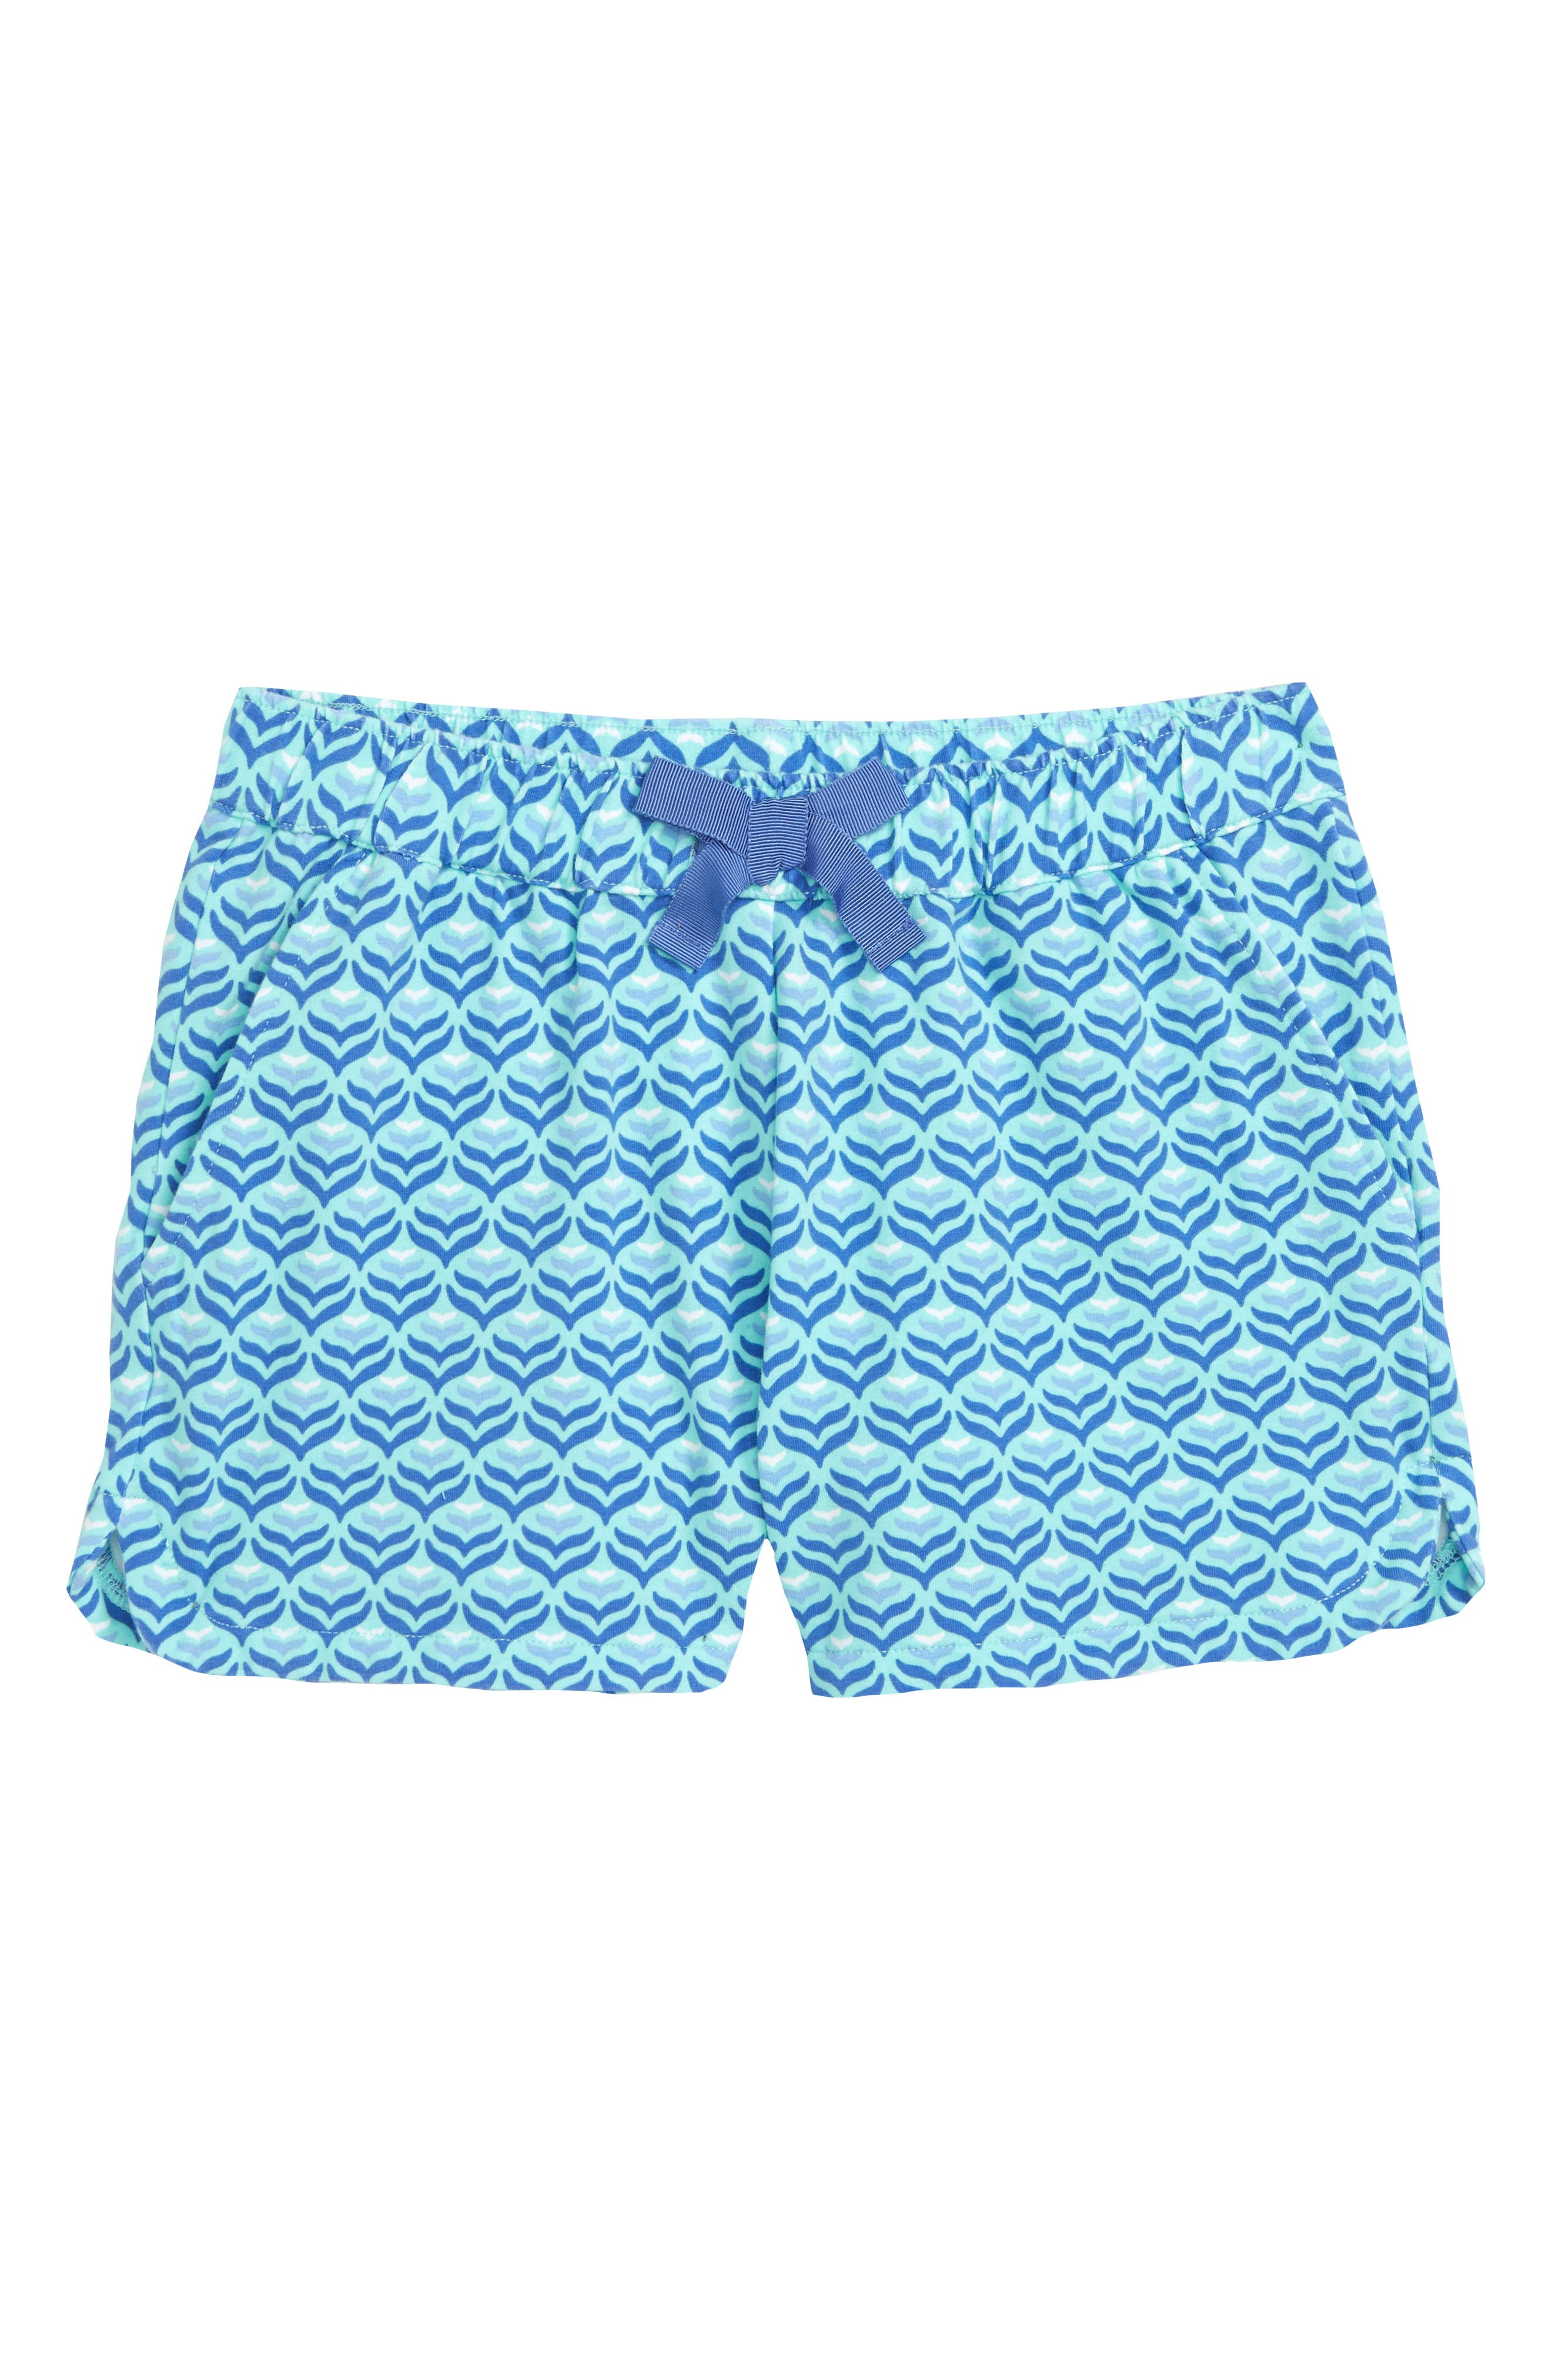 Diamond Whale Tail Shorts,                             Main thumbnail 1, color,                             416